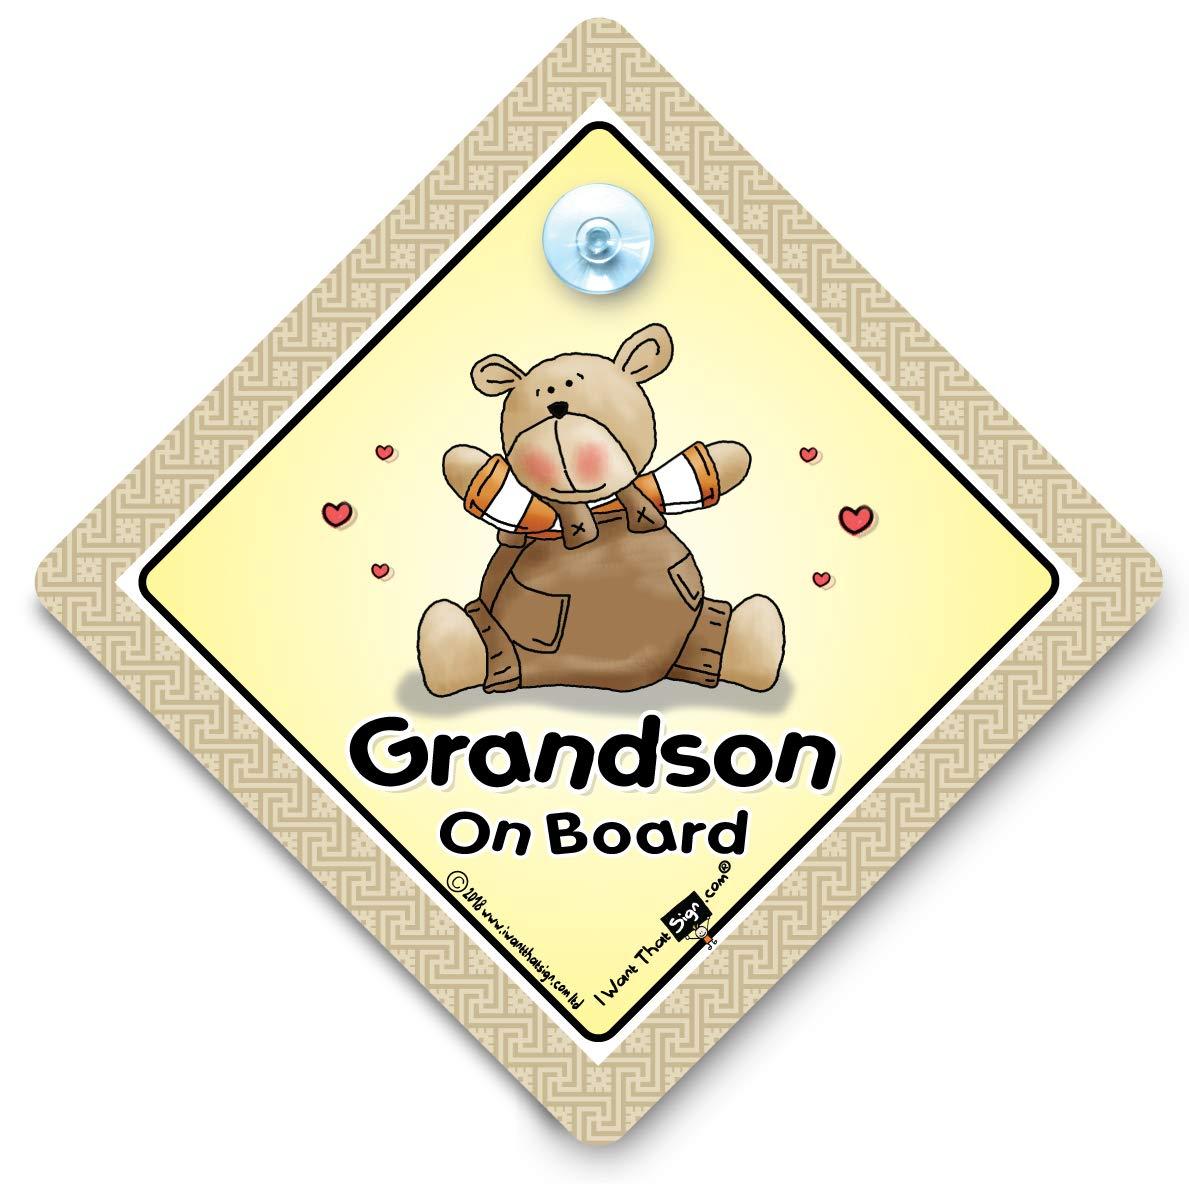 Grandchild On Board Yellow Suction Safety Fun Car Display Window Badge Sign